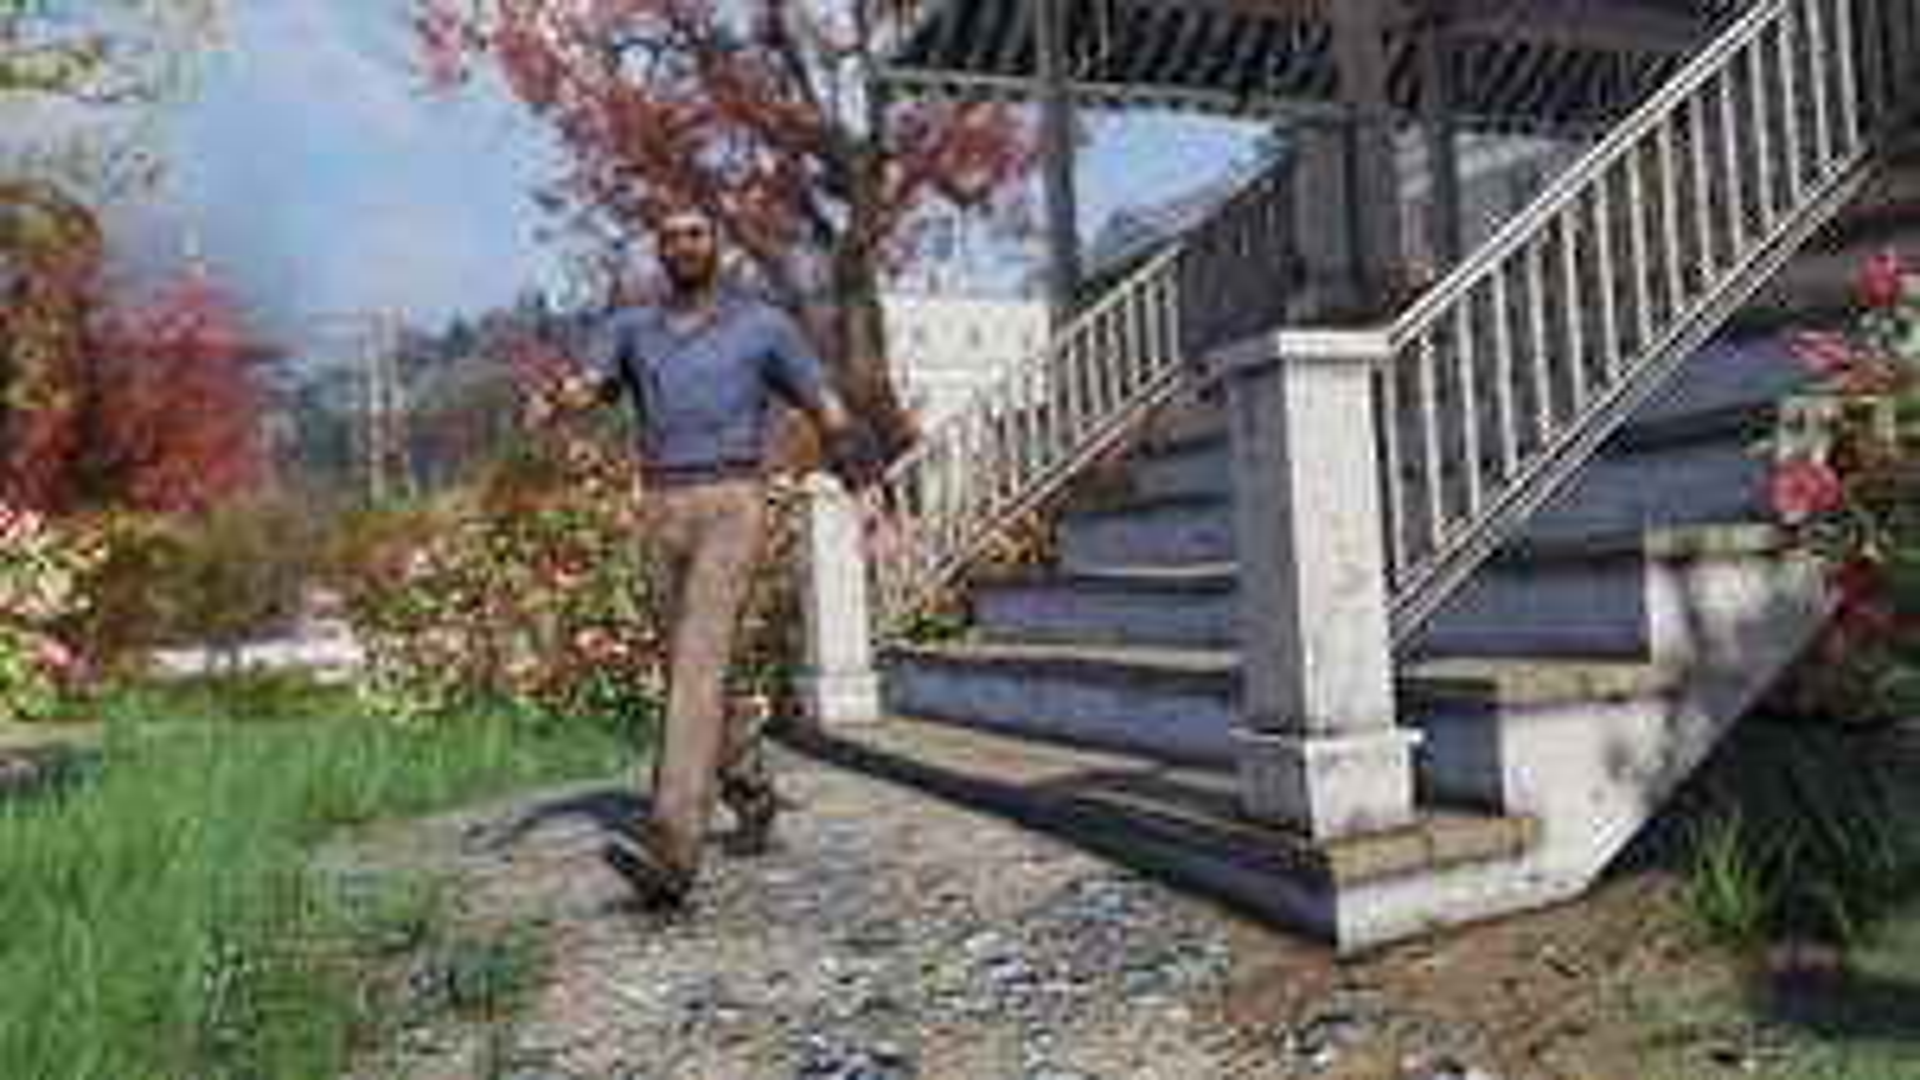 Fallout 76 - Blaues Shirt und Braune Hose-Outfit kostenlos im Ingame-Shop